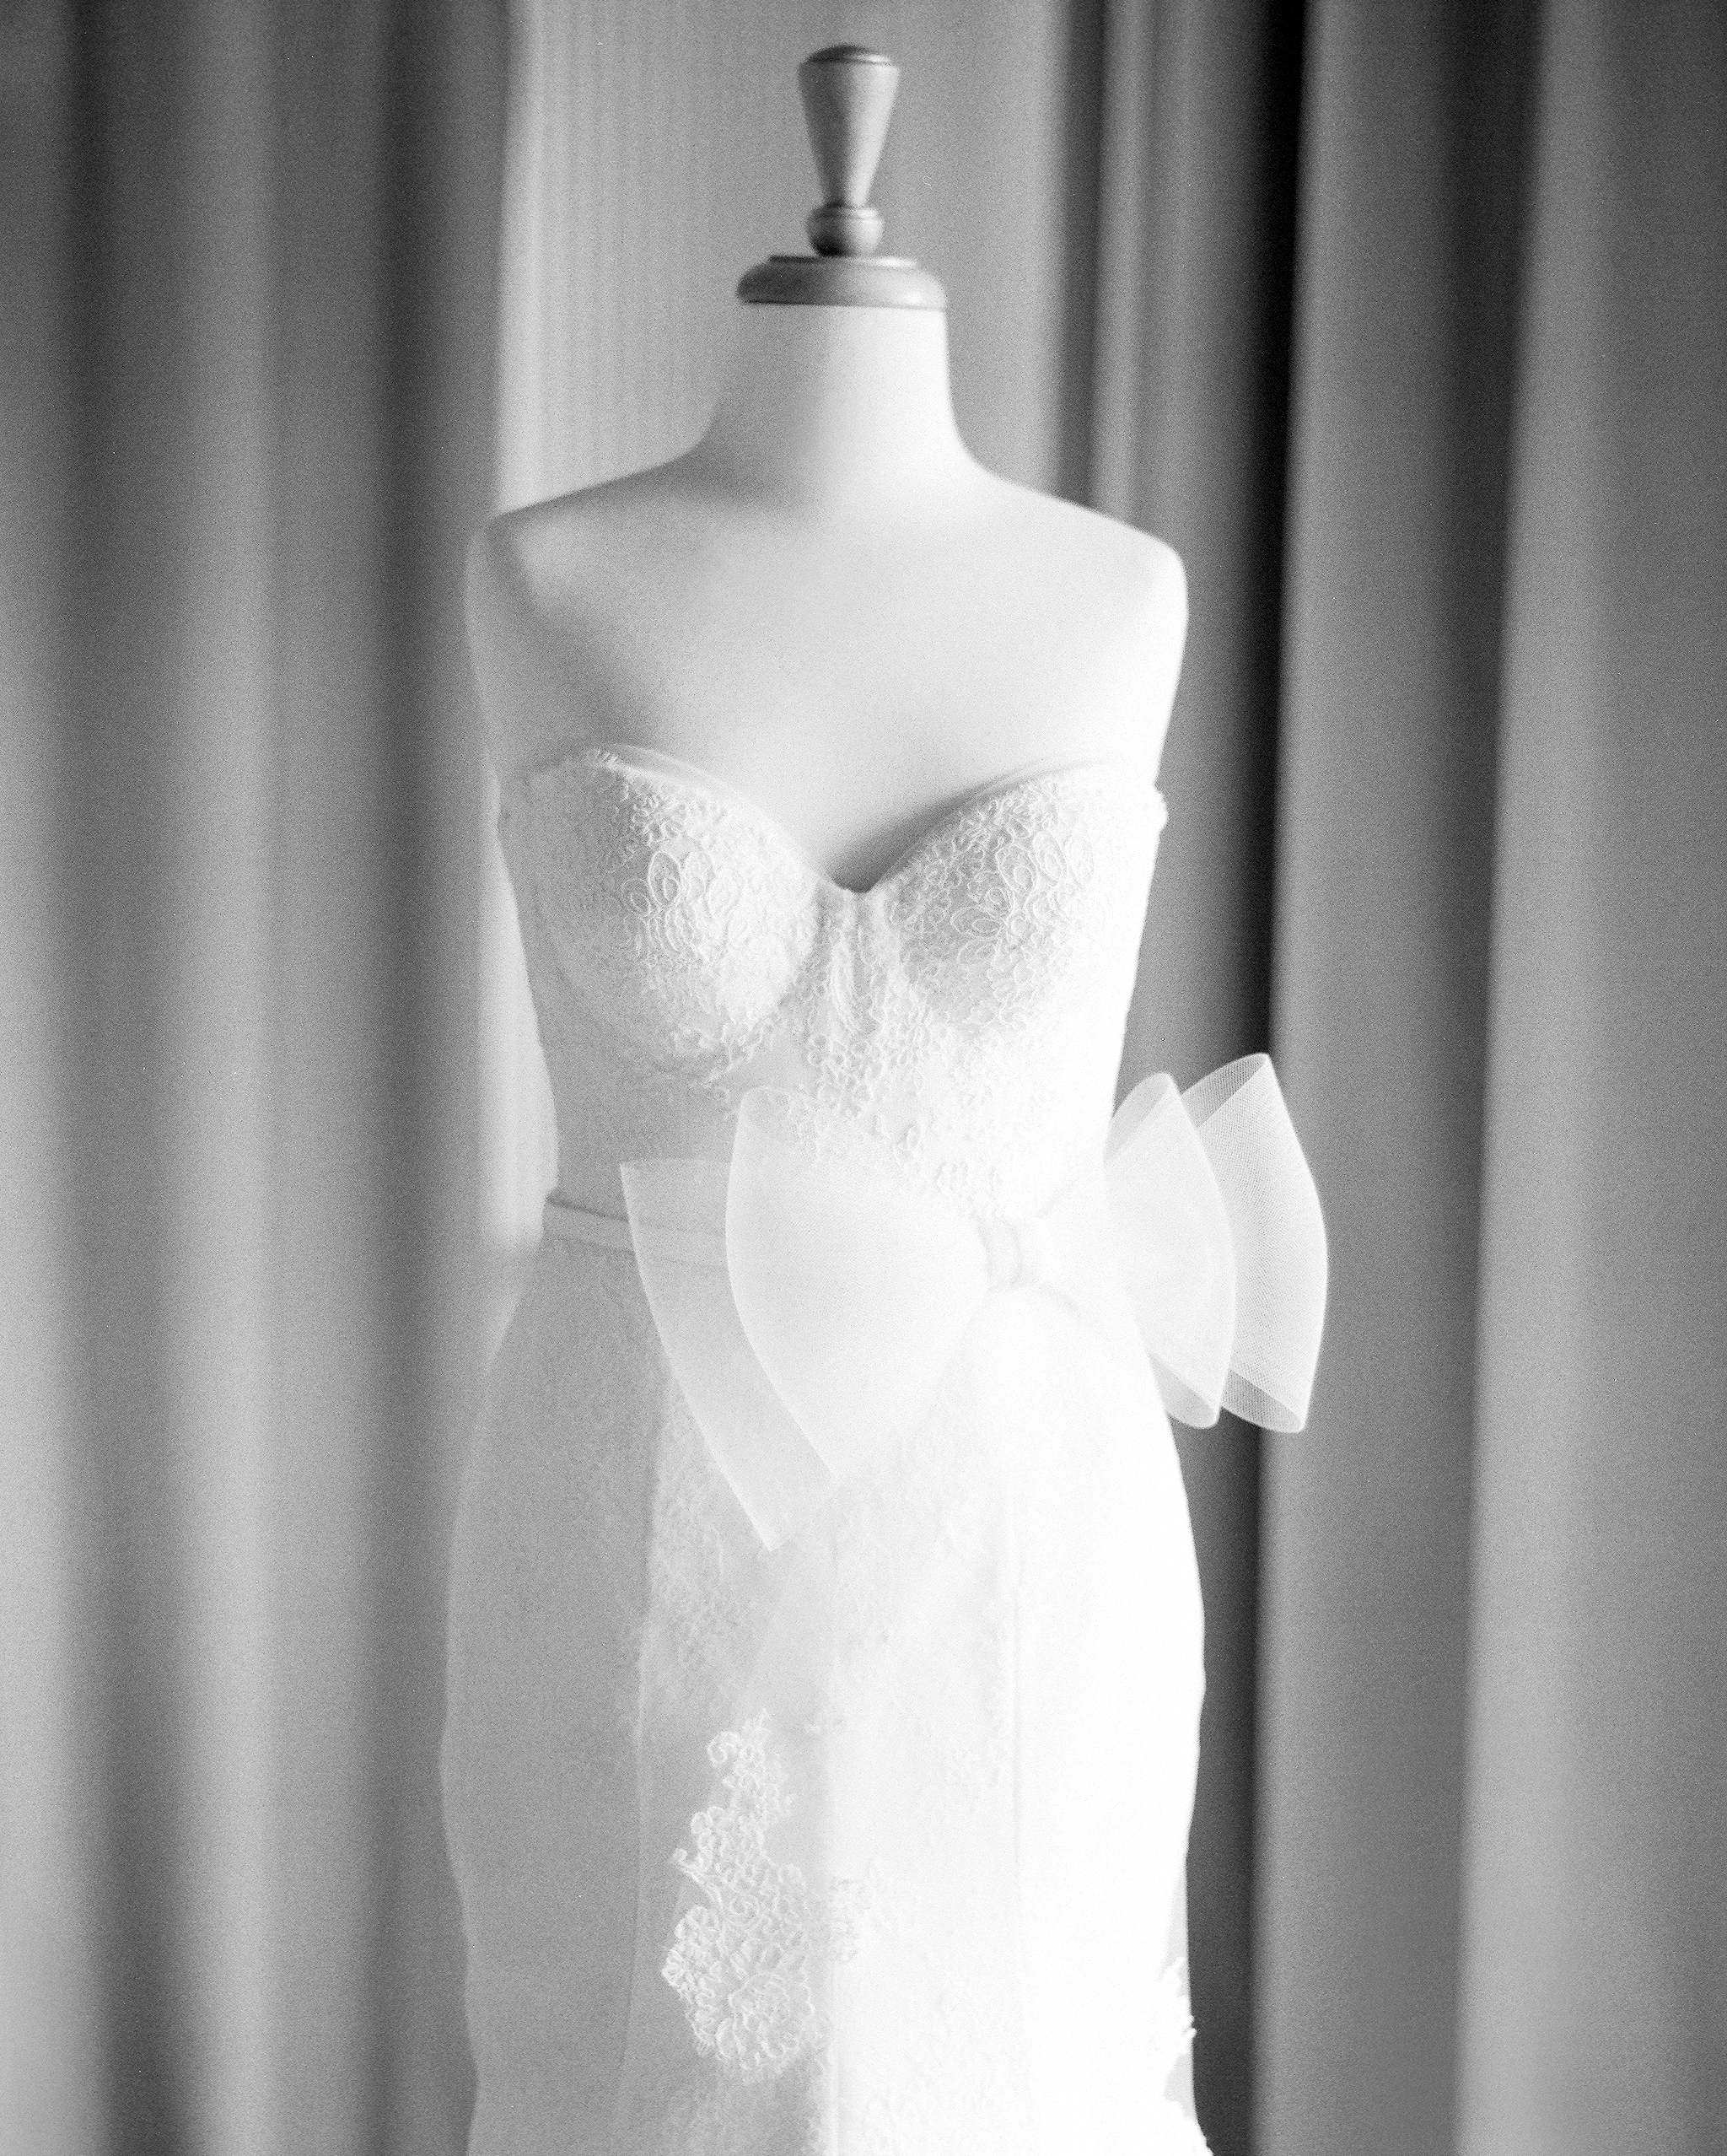 jemma-michael-wedding-dress-26990005-s112110-0815.jpg